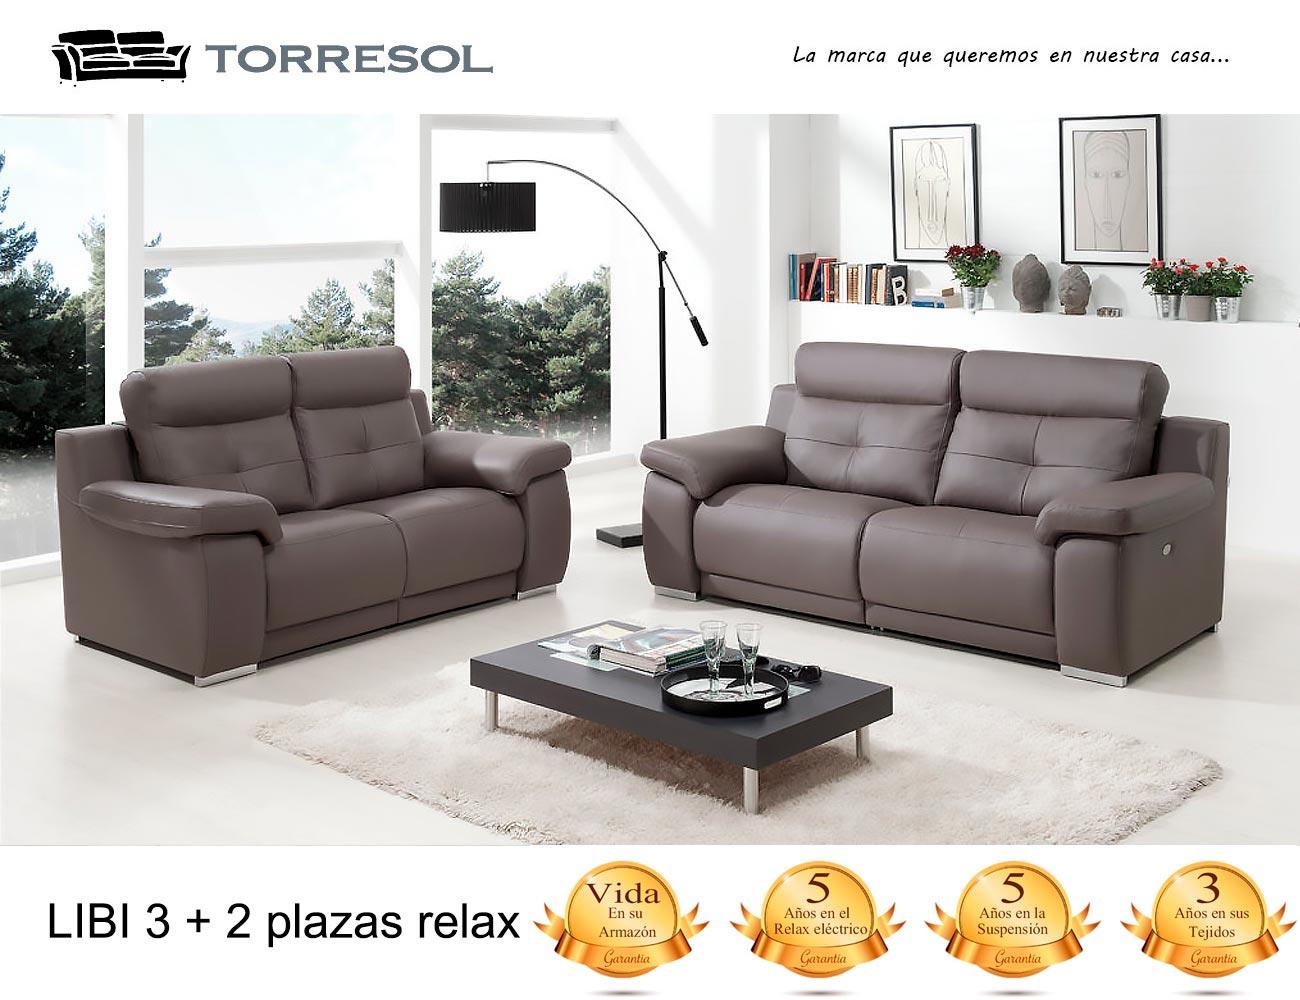 Sofa libi torresol en piel chocolate 2